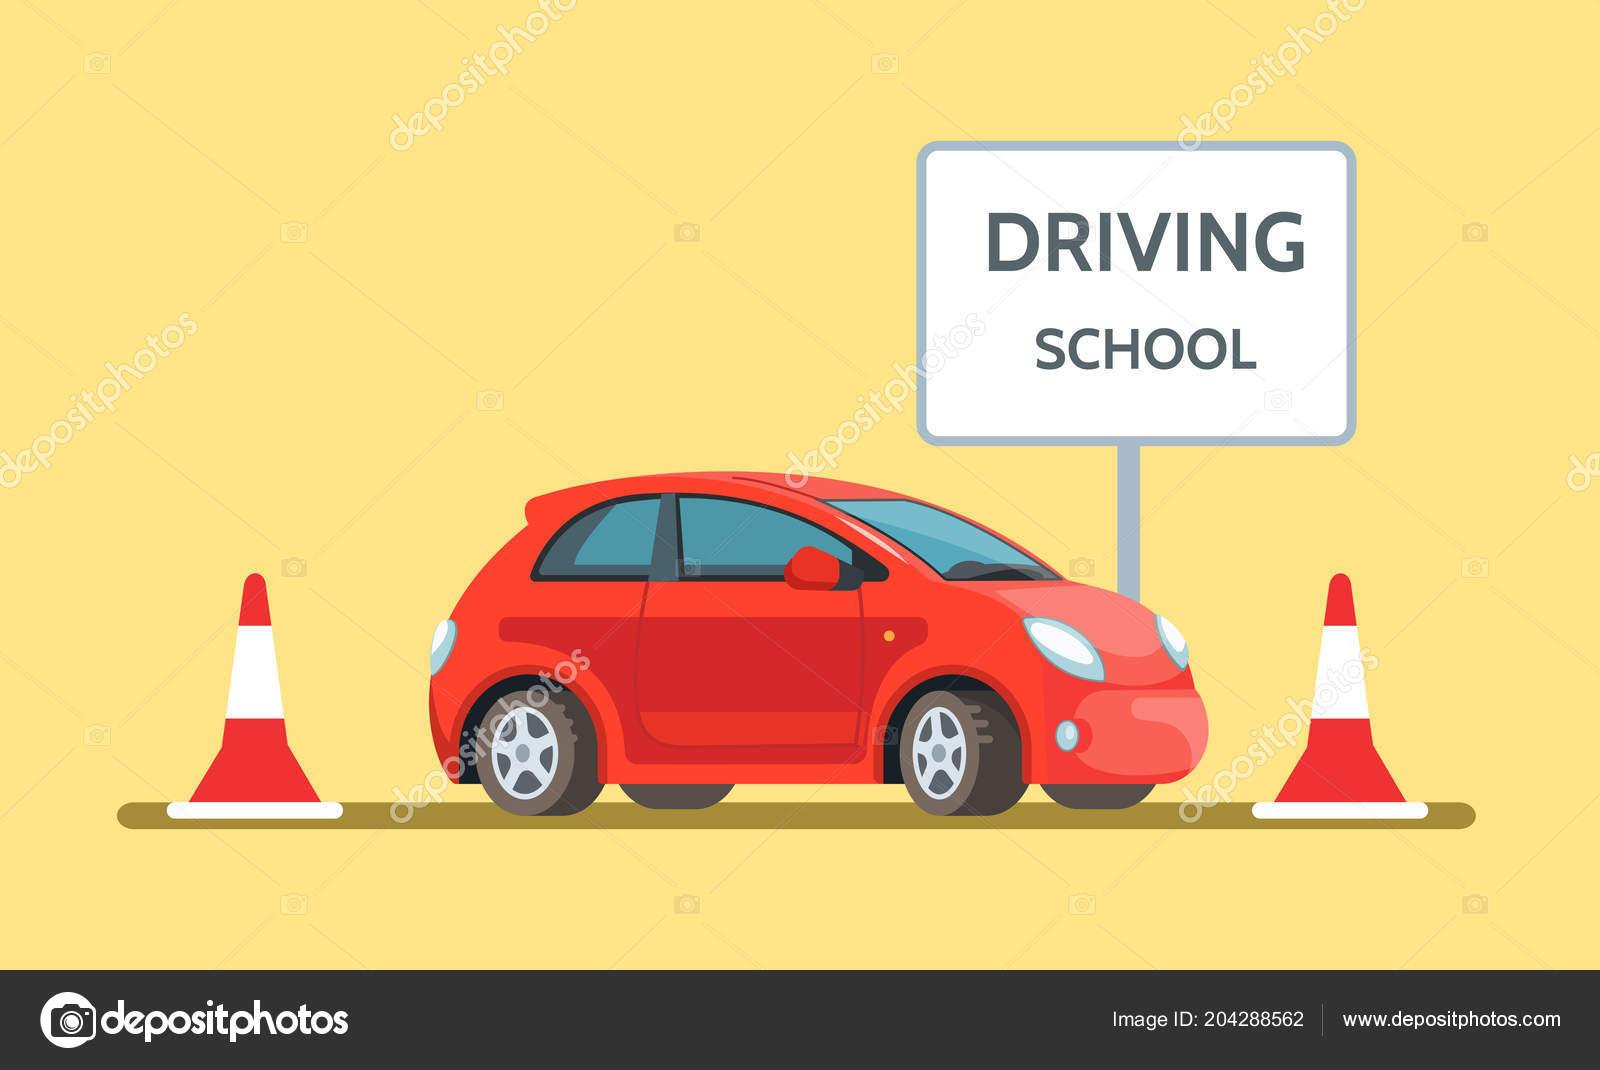 Vector Illustration Red Car Driving School Outdoor Flat